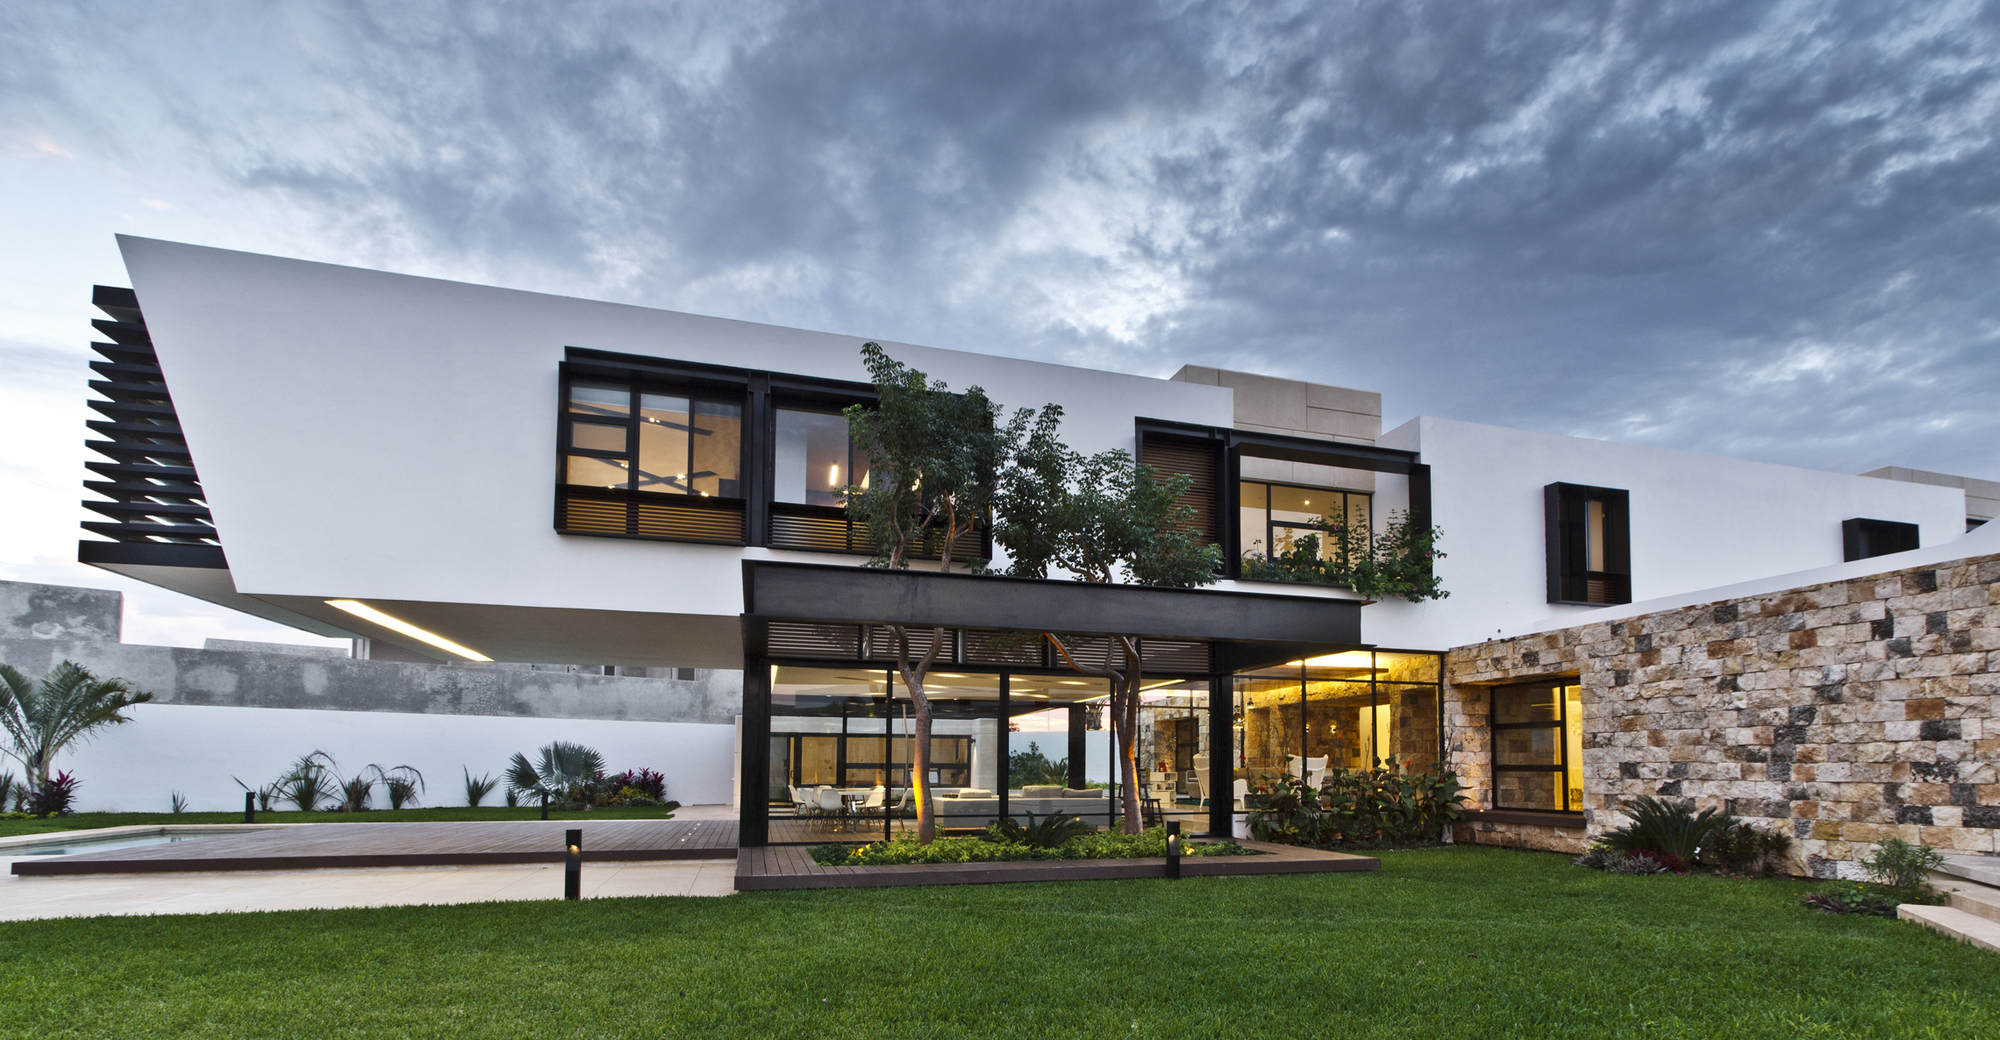 Contemporary-Comfort-At-The-Temozón-House-in-Yucatan-Mexico-1